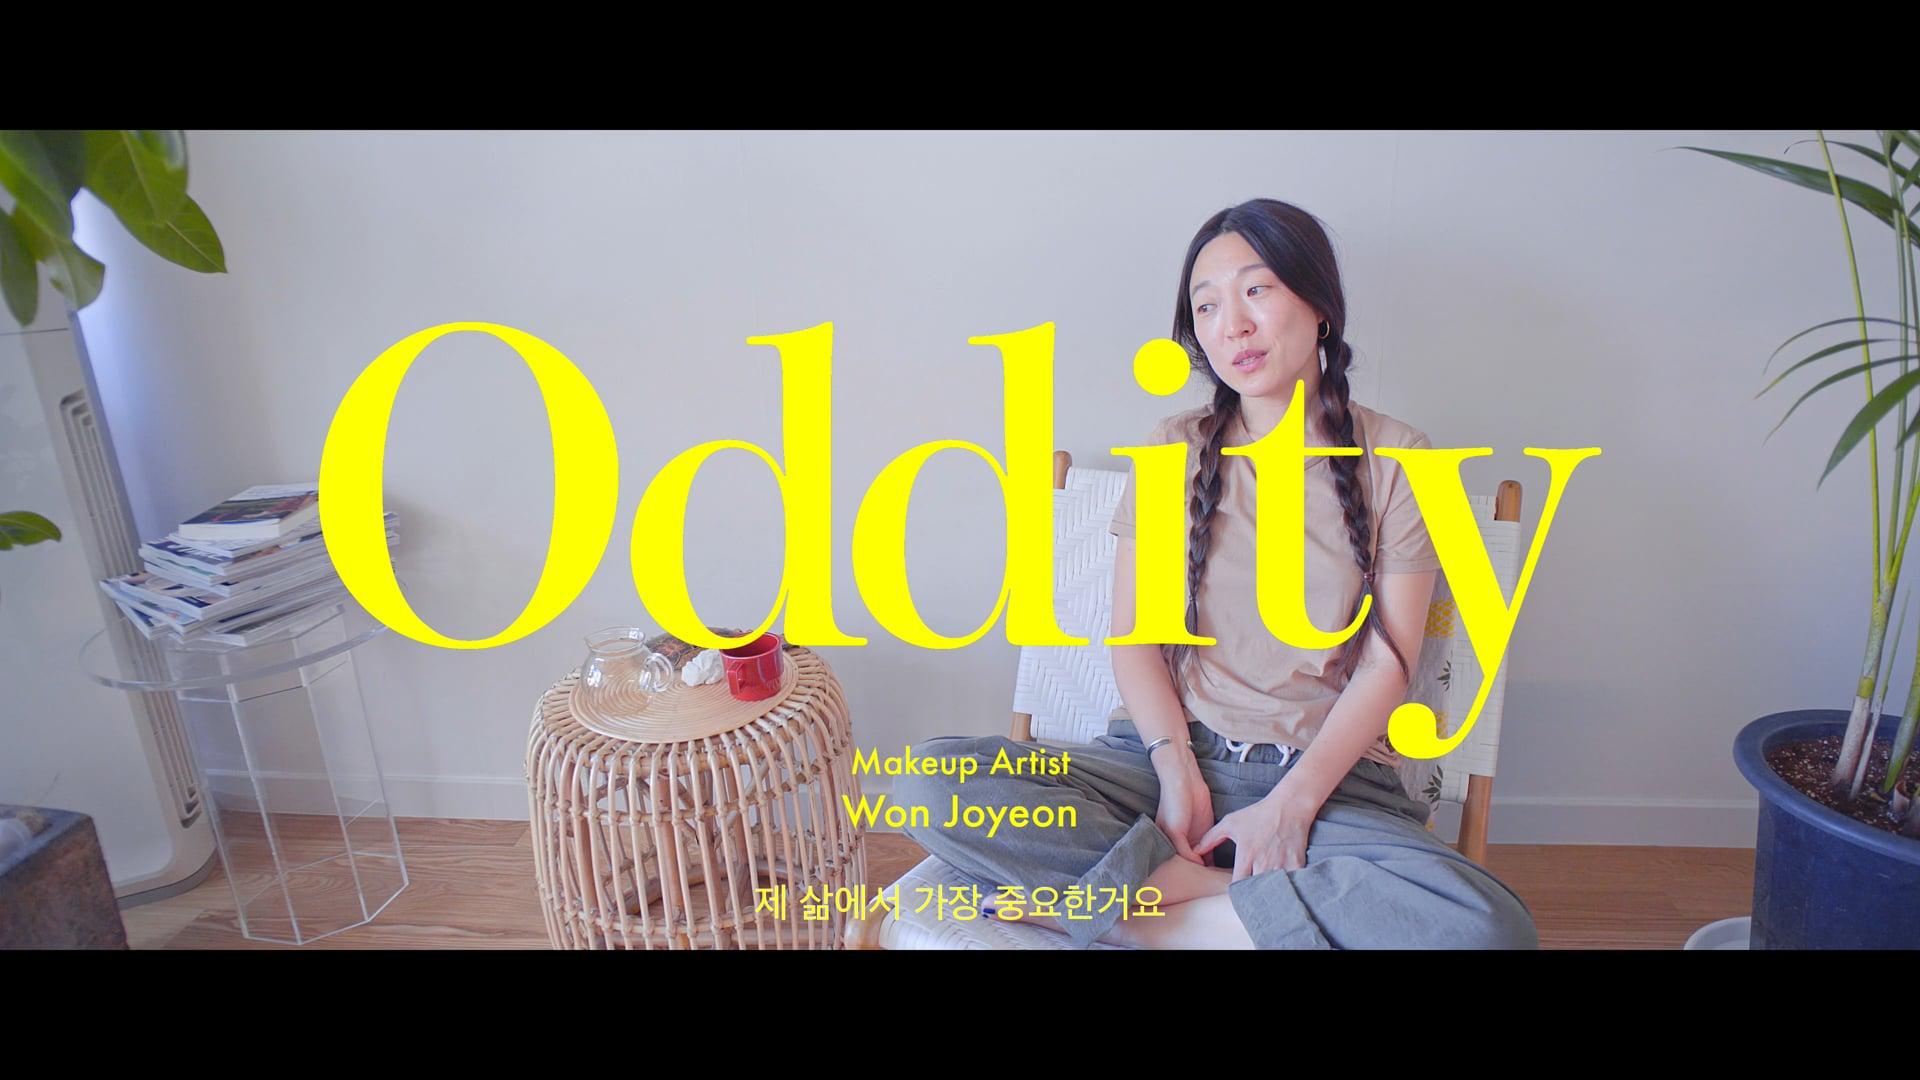 Oddity - Make up Artist 원조연